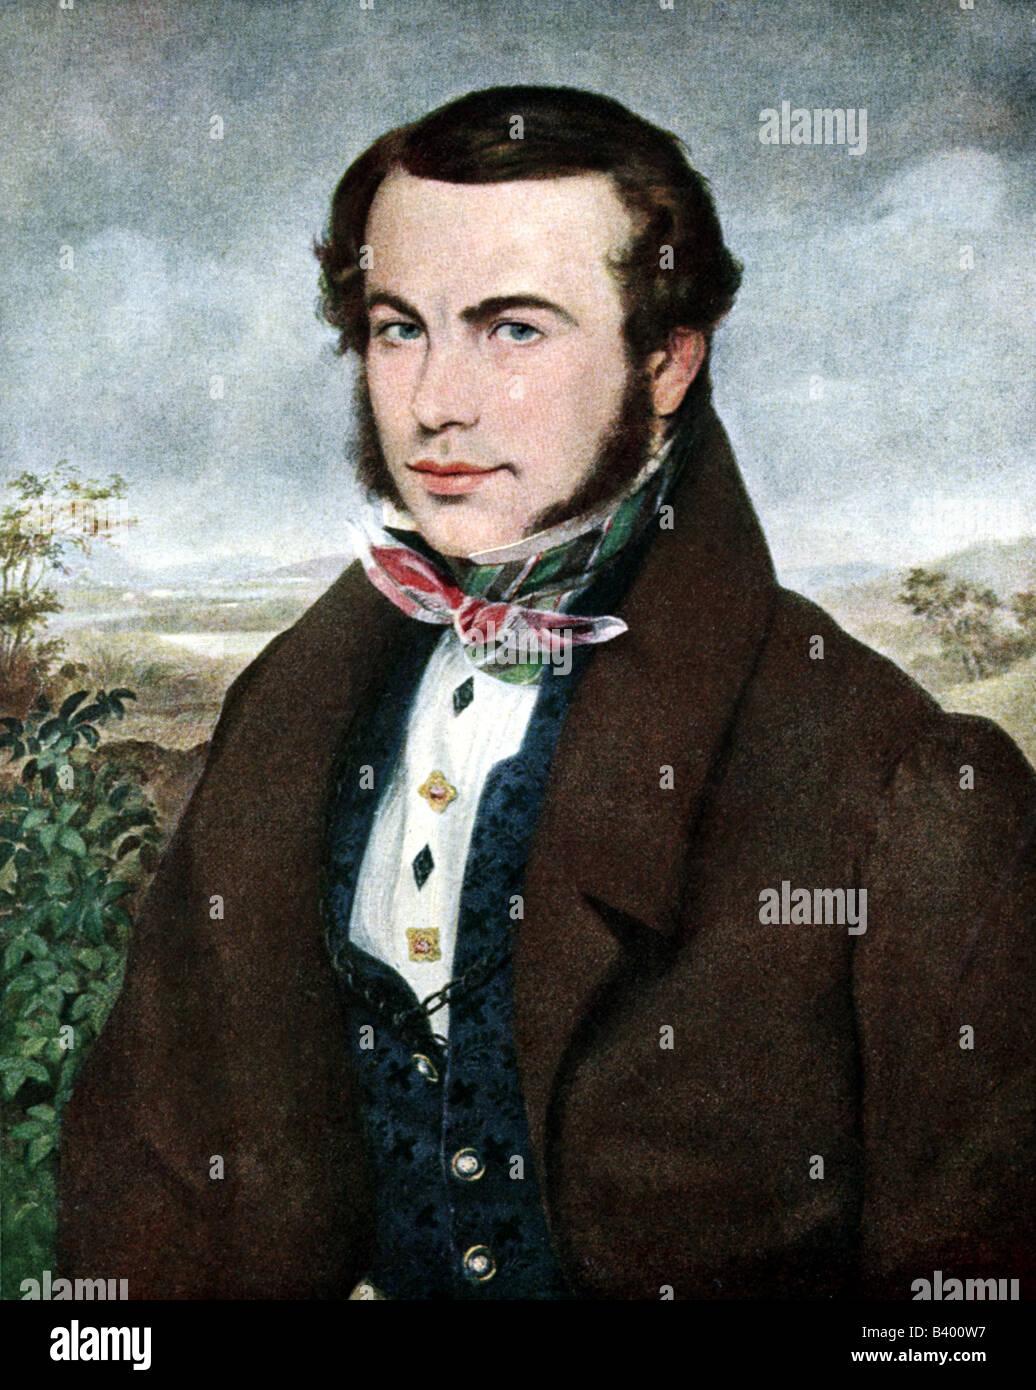 Stifter, Adalbert, 23.10.1805 - 28.1.1868, Austrian author / writer, portrait, Ferdinand Georg Waldmüller, - Stock Image